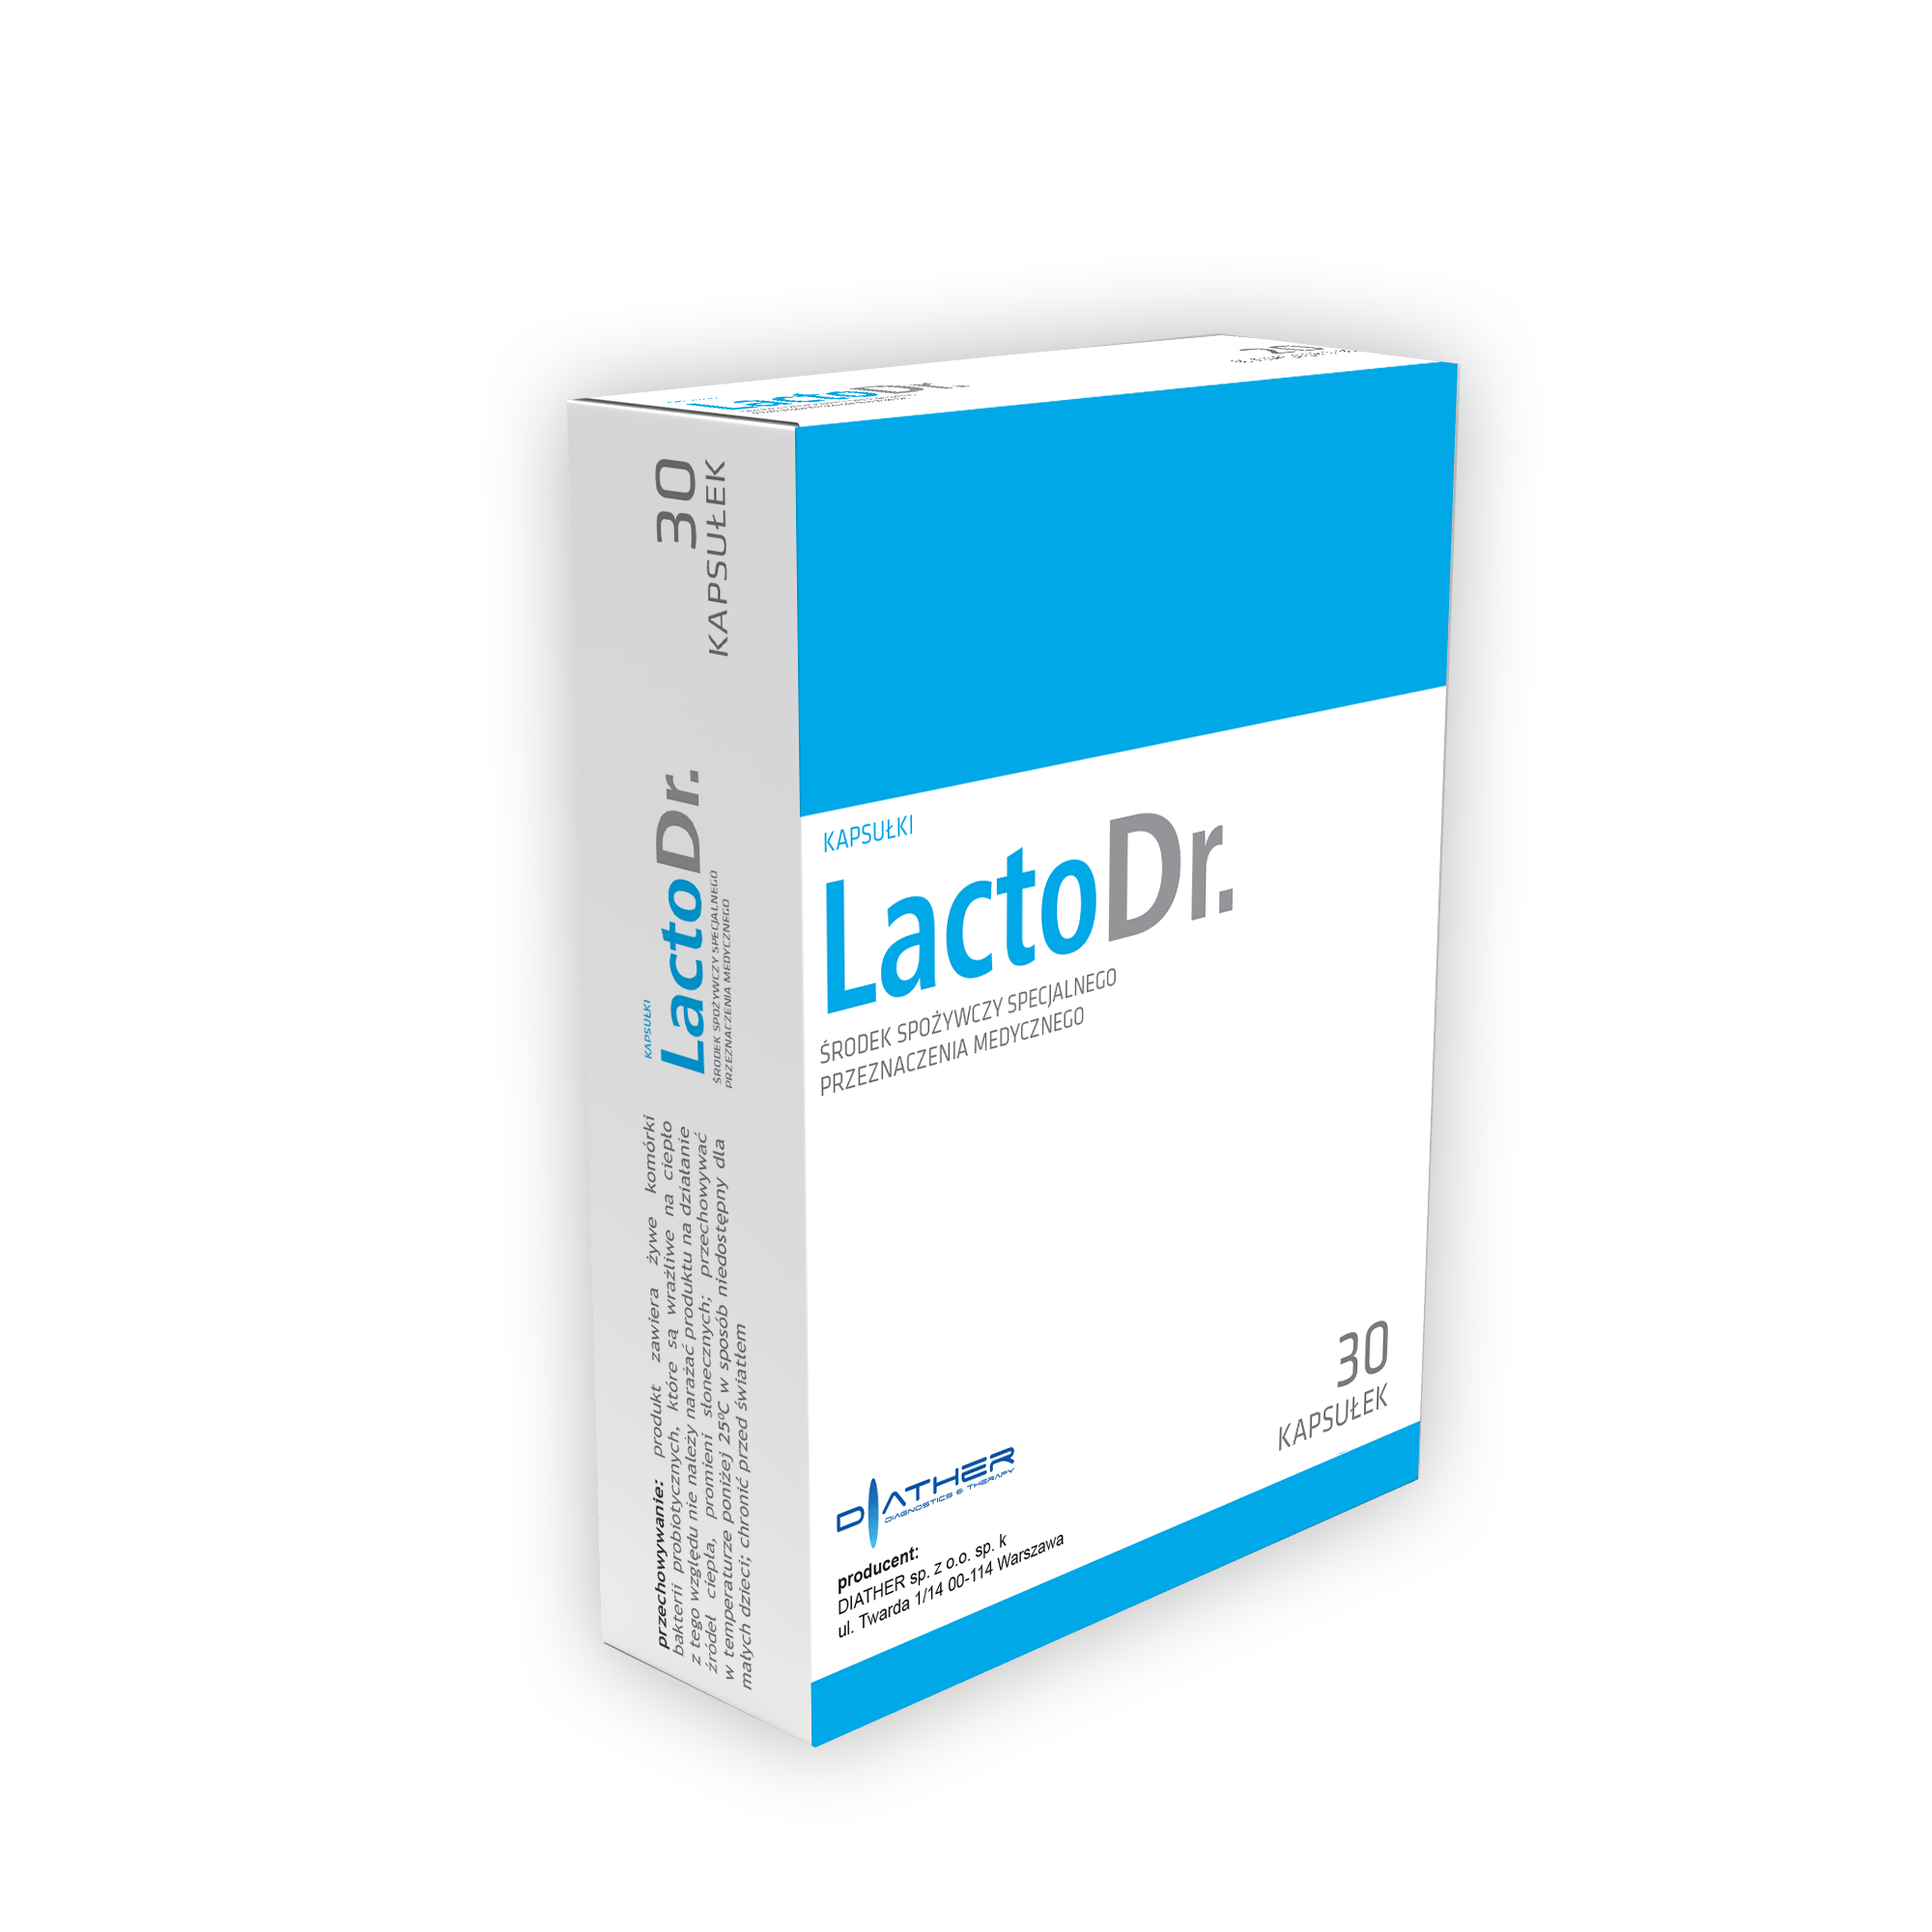 LactoDr. 20 kaps./ 30 kaps.